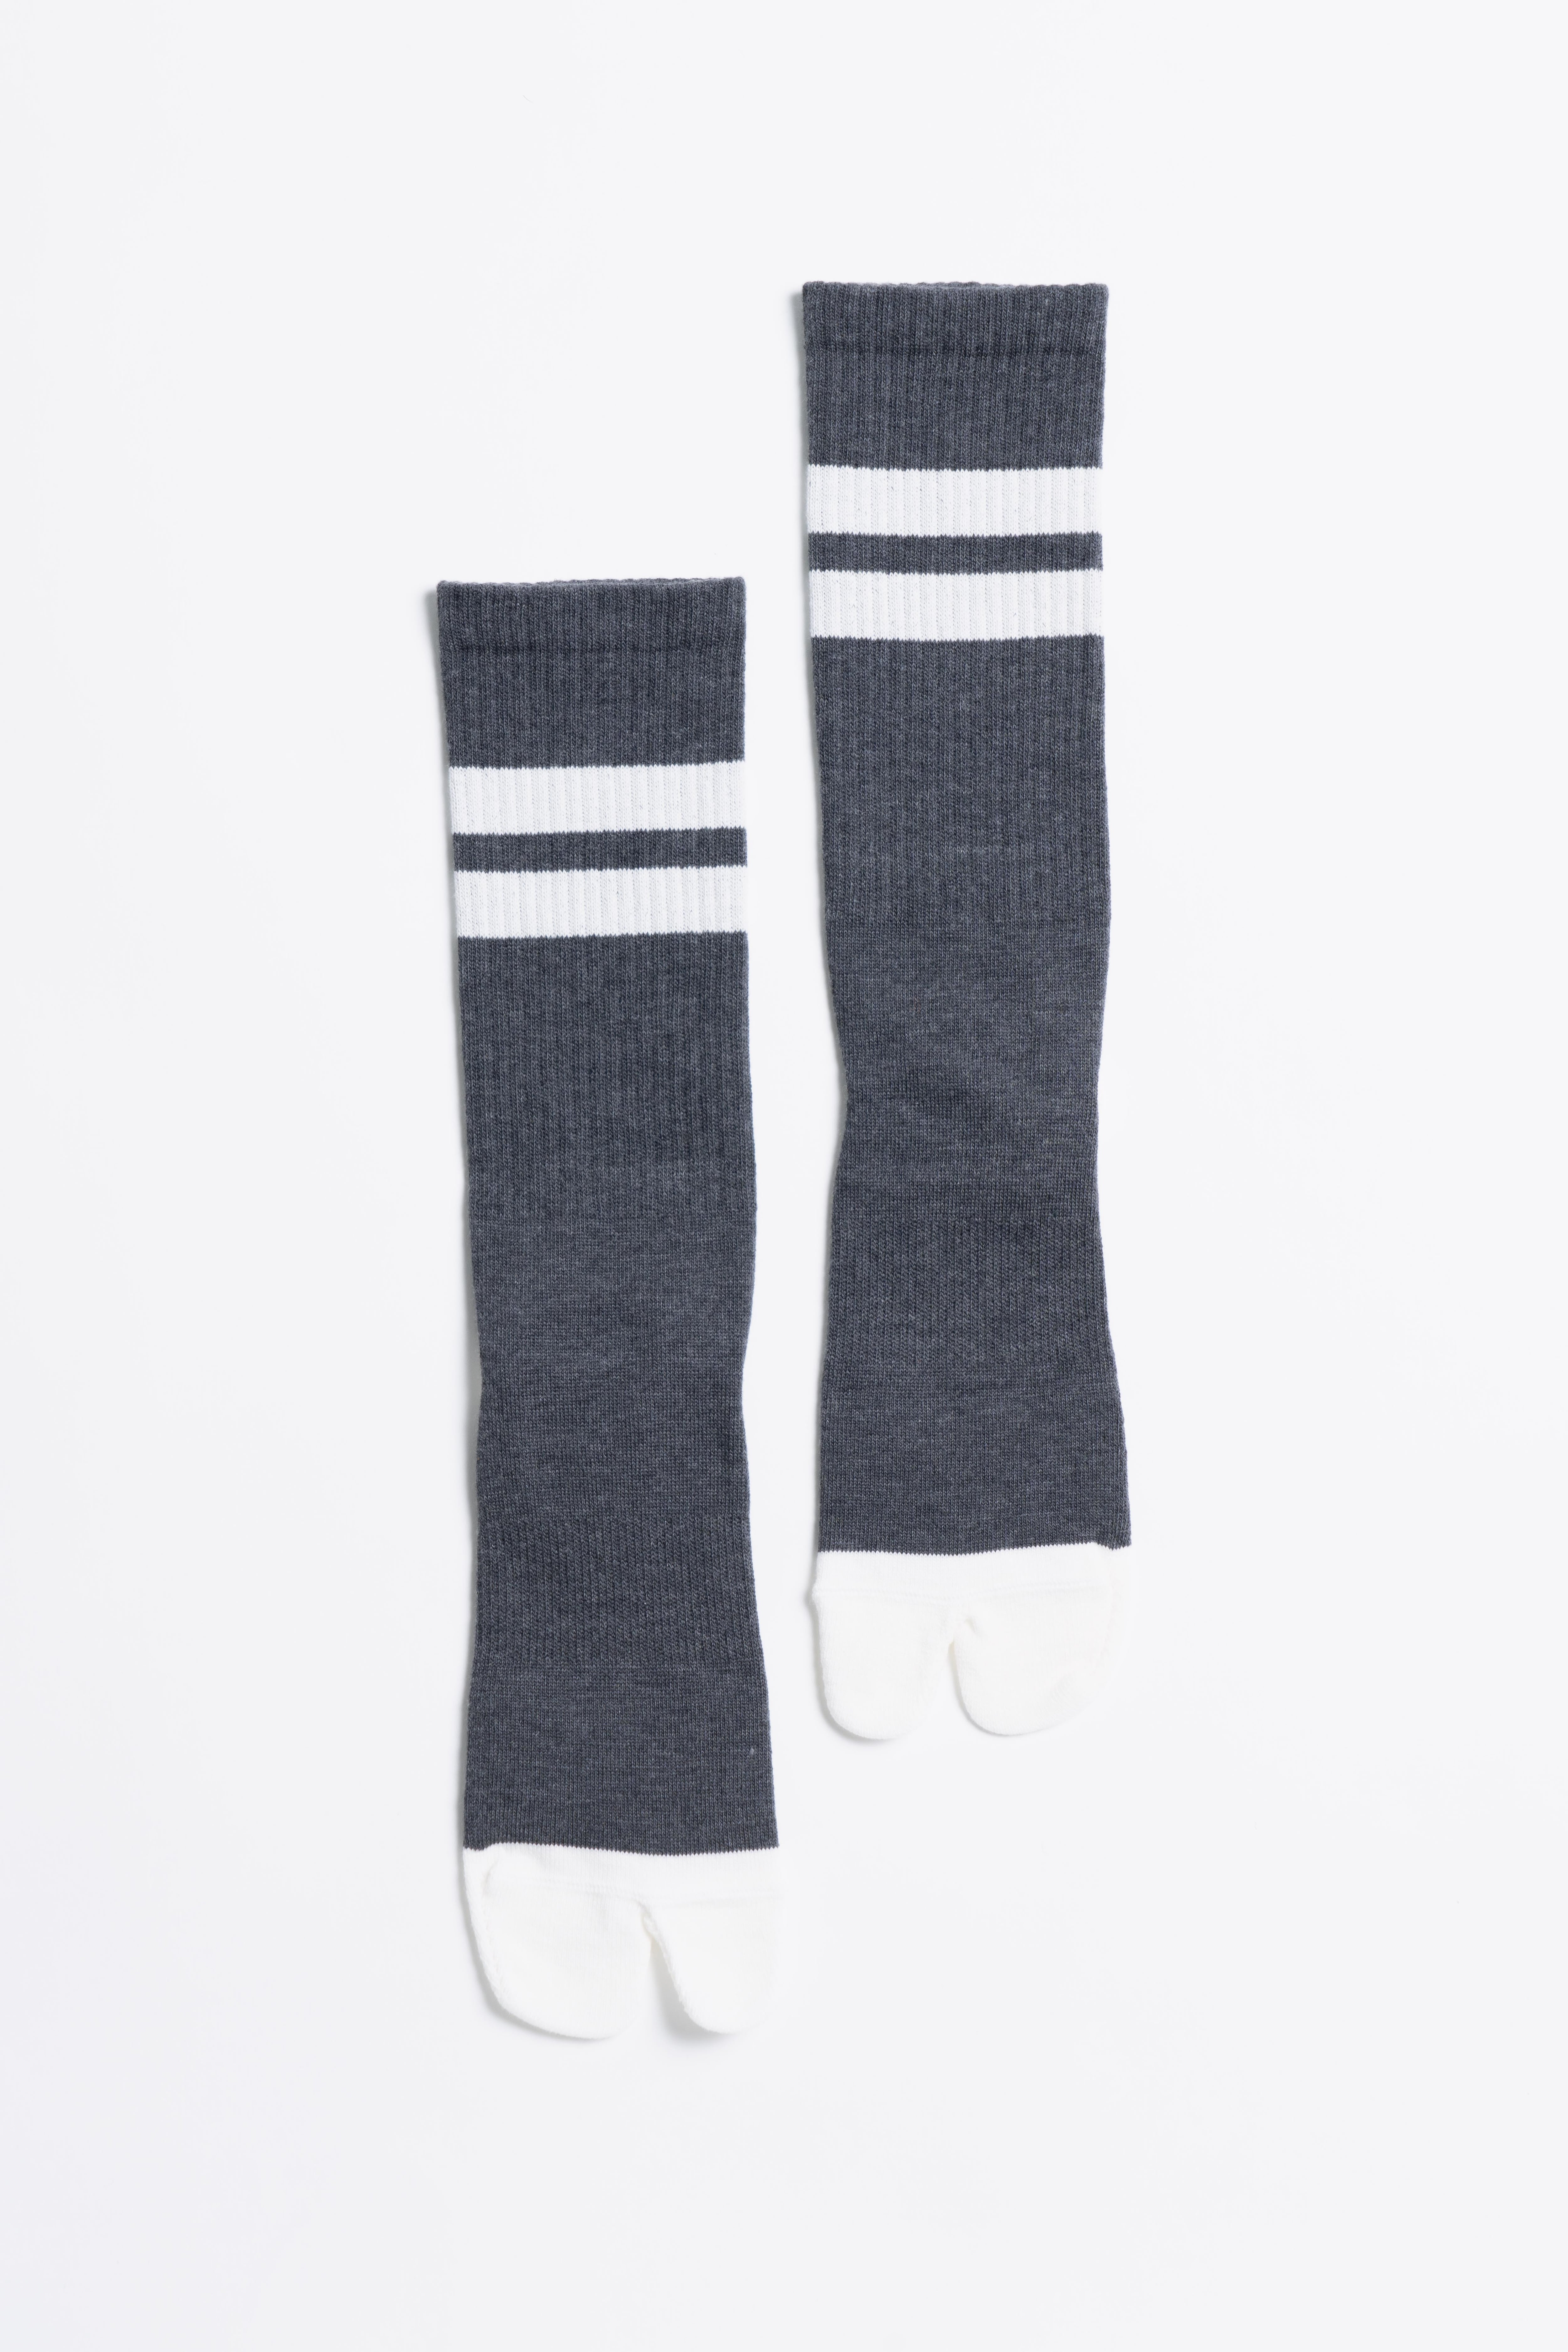 Signature Socks(Charcoal × White)